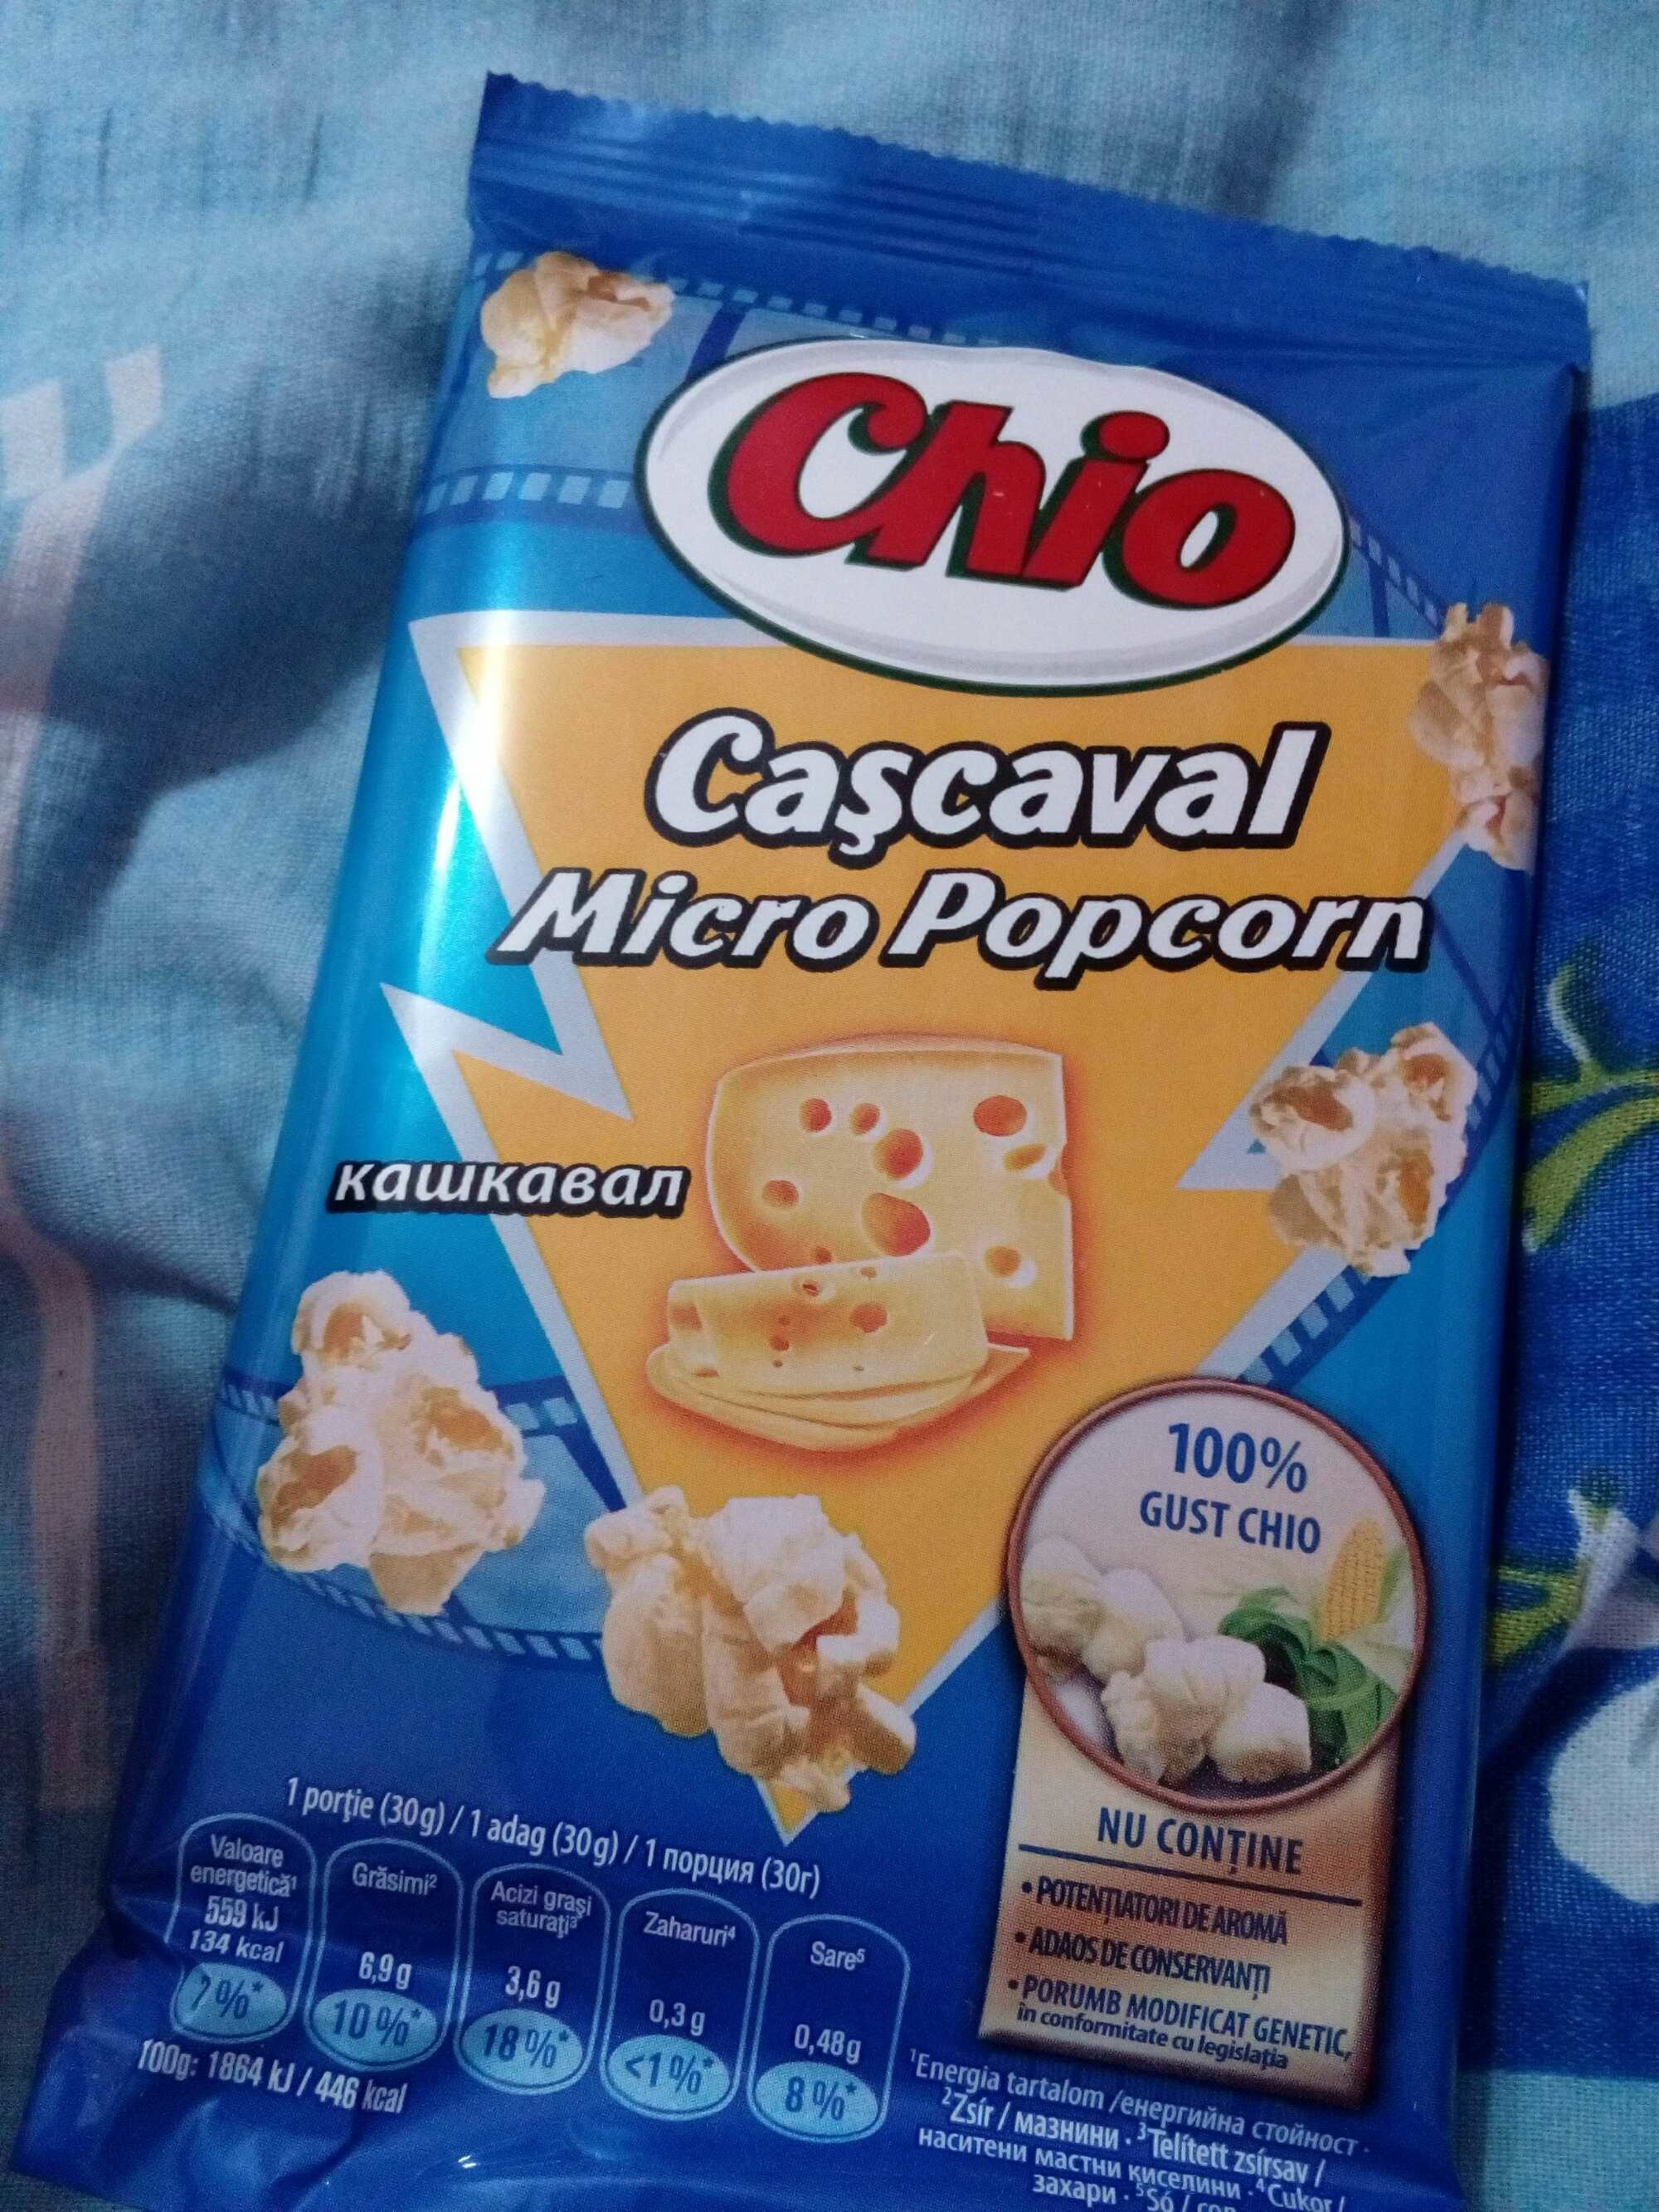 Chio popcorn cascaval - Product - ro